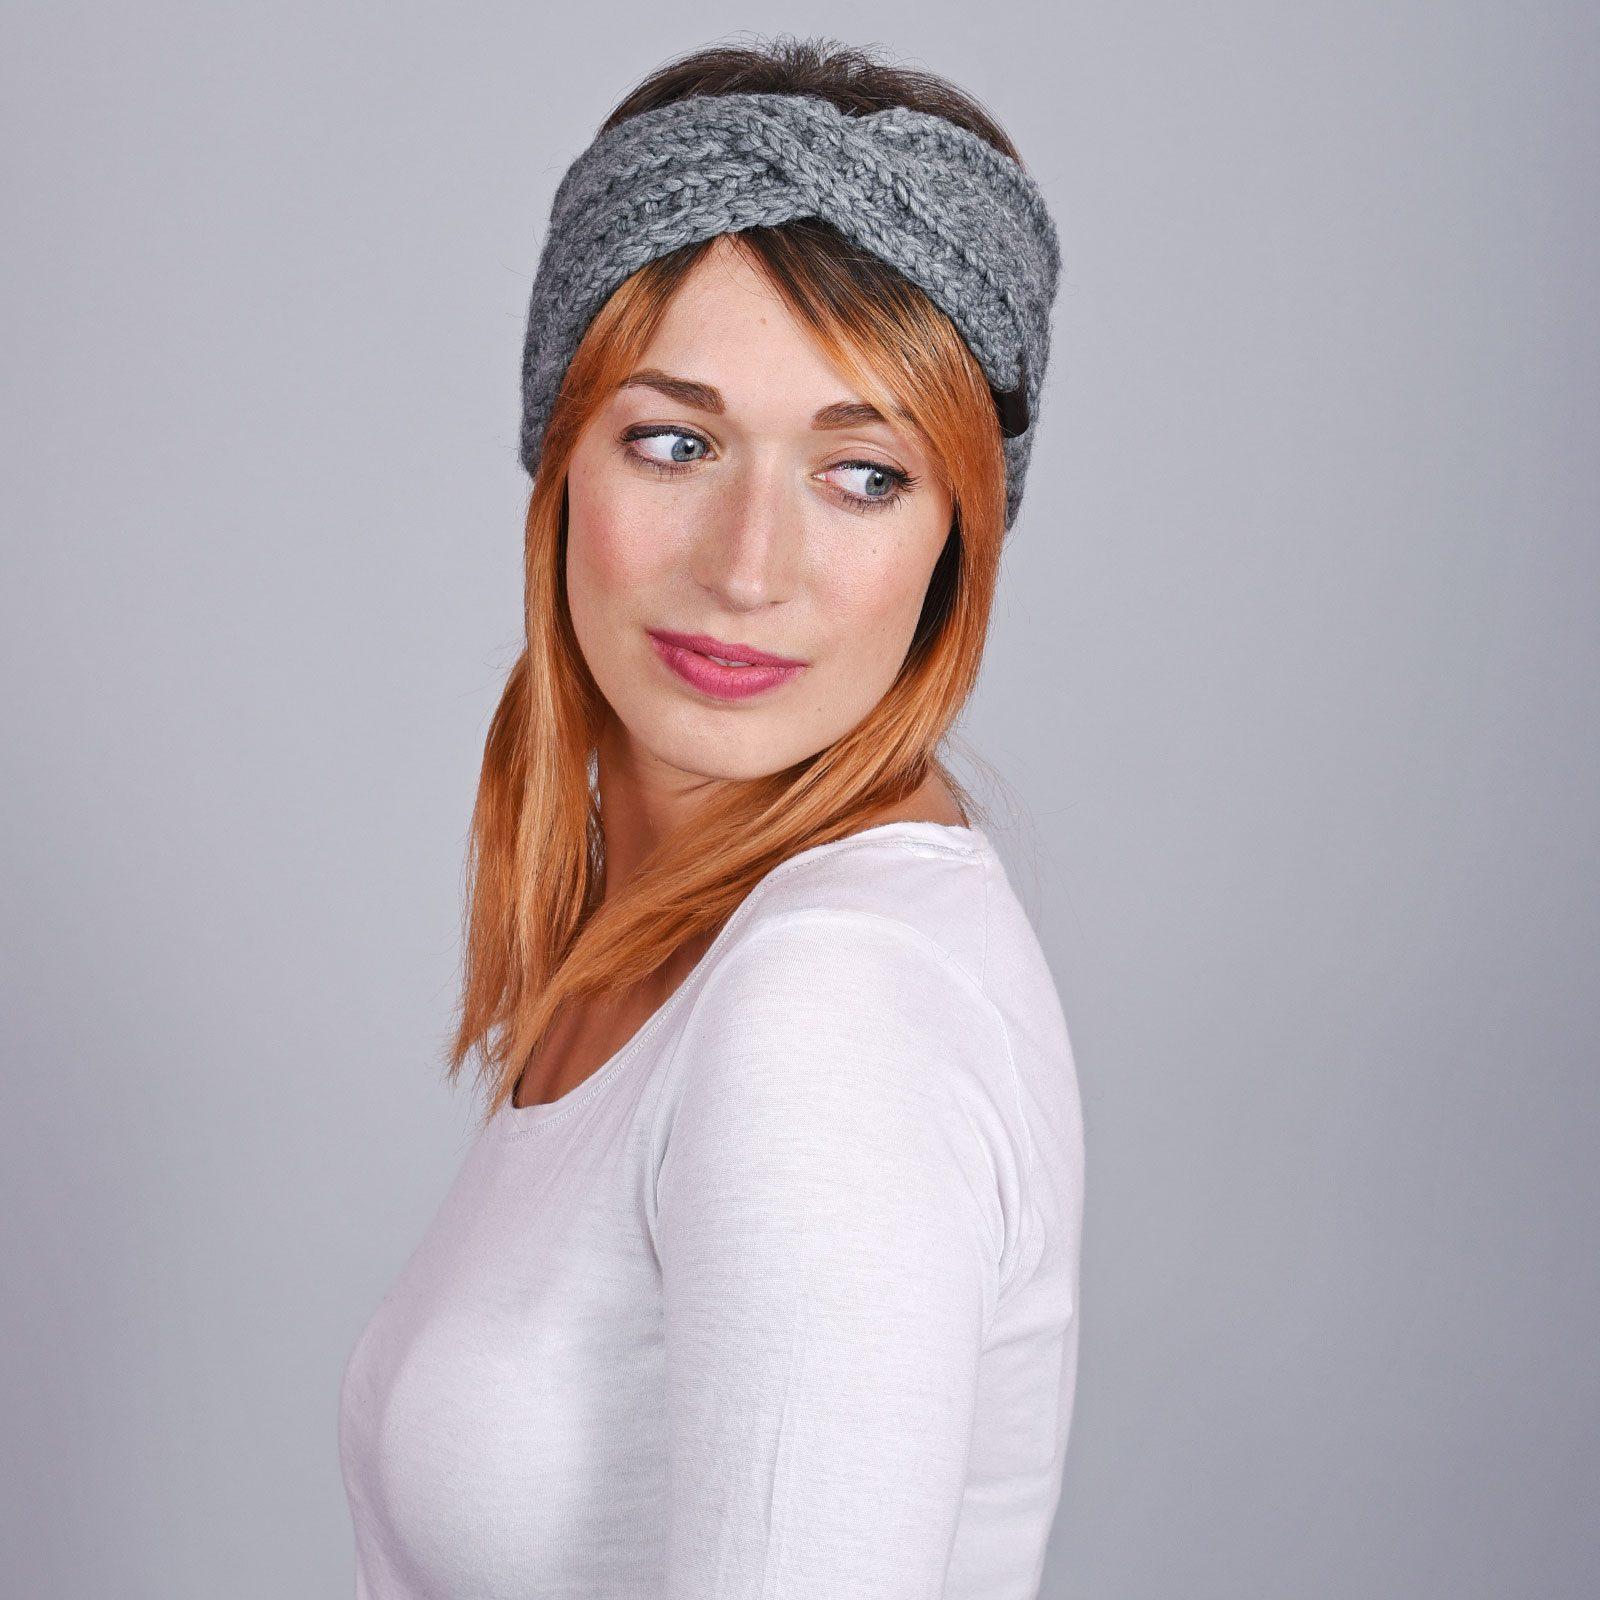 http://lookbook.allee-du-foulard.fr/wp-content/uploads/2018/12/CP-01076-VF16-2-bandeau-femme-gris-ardoise-tendance-1600x1600.jpg